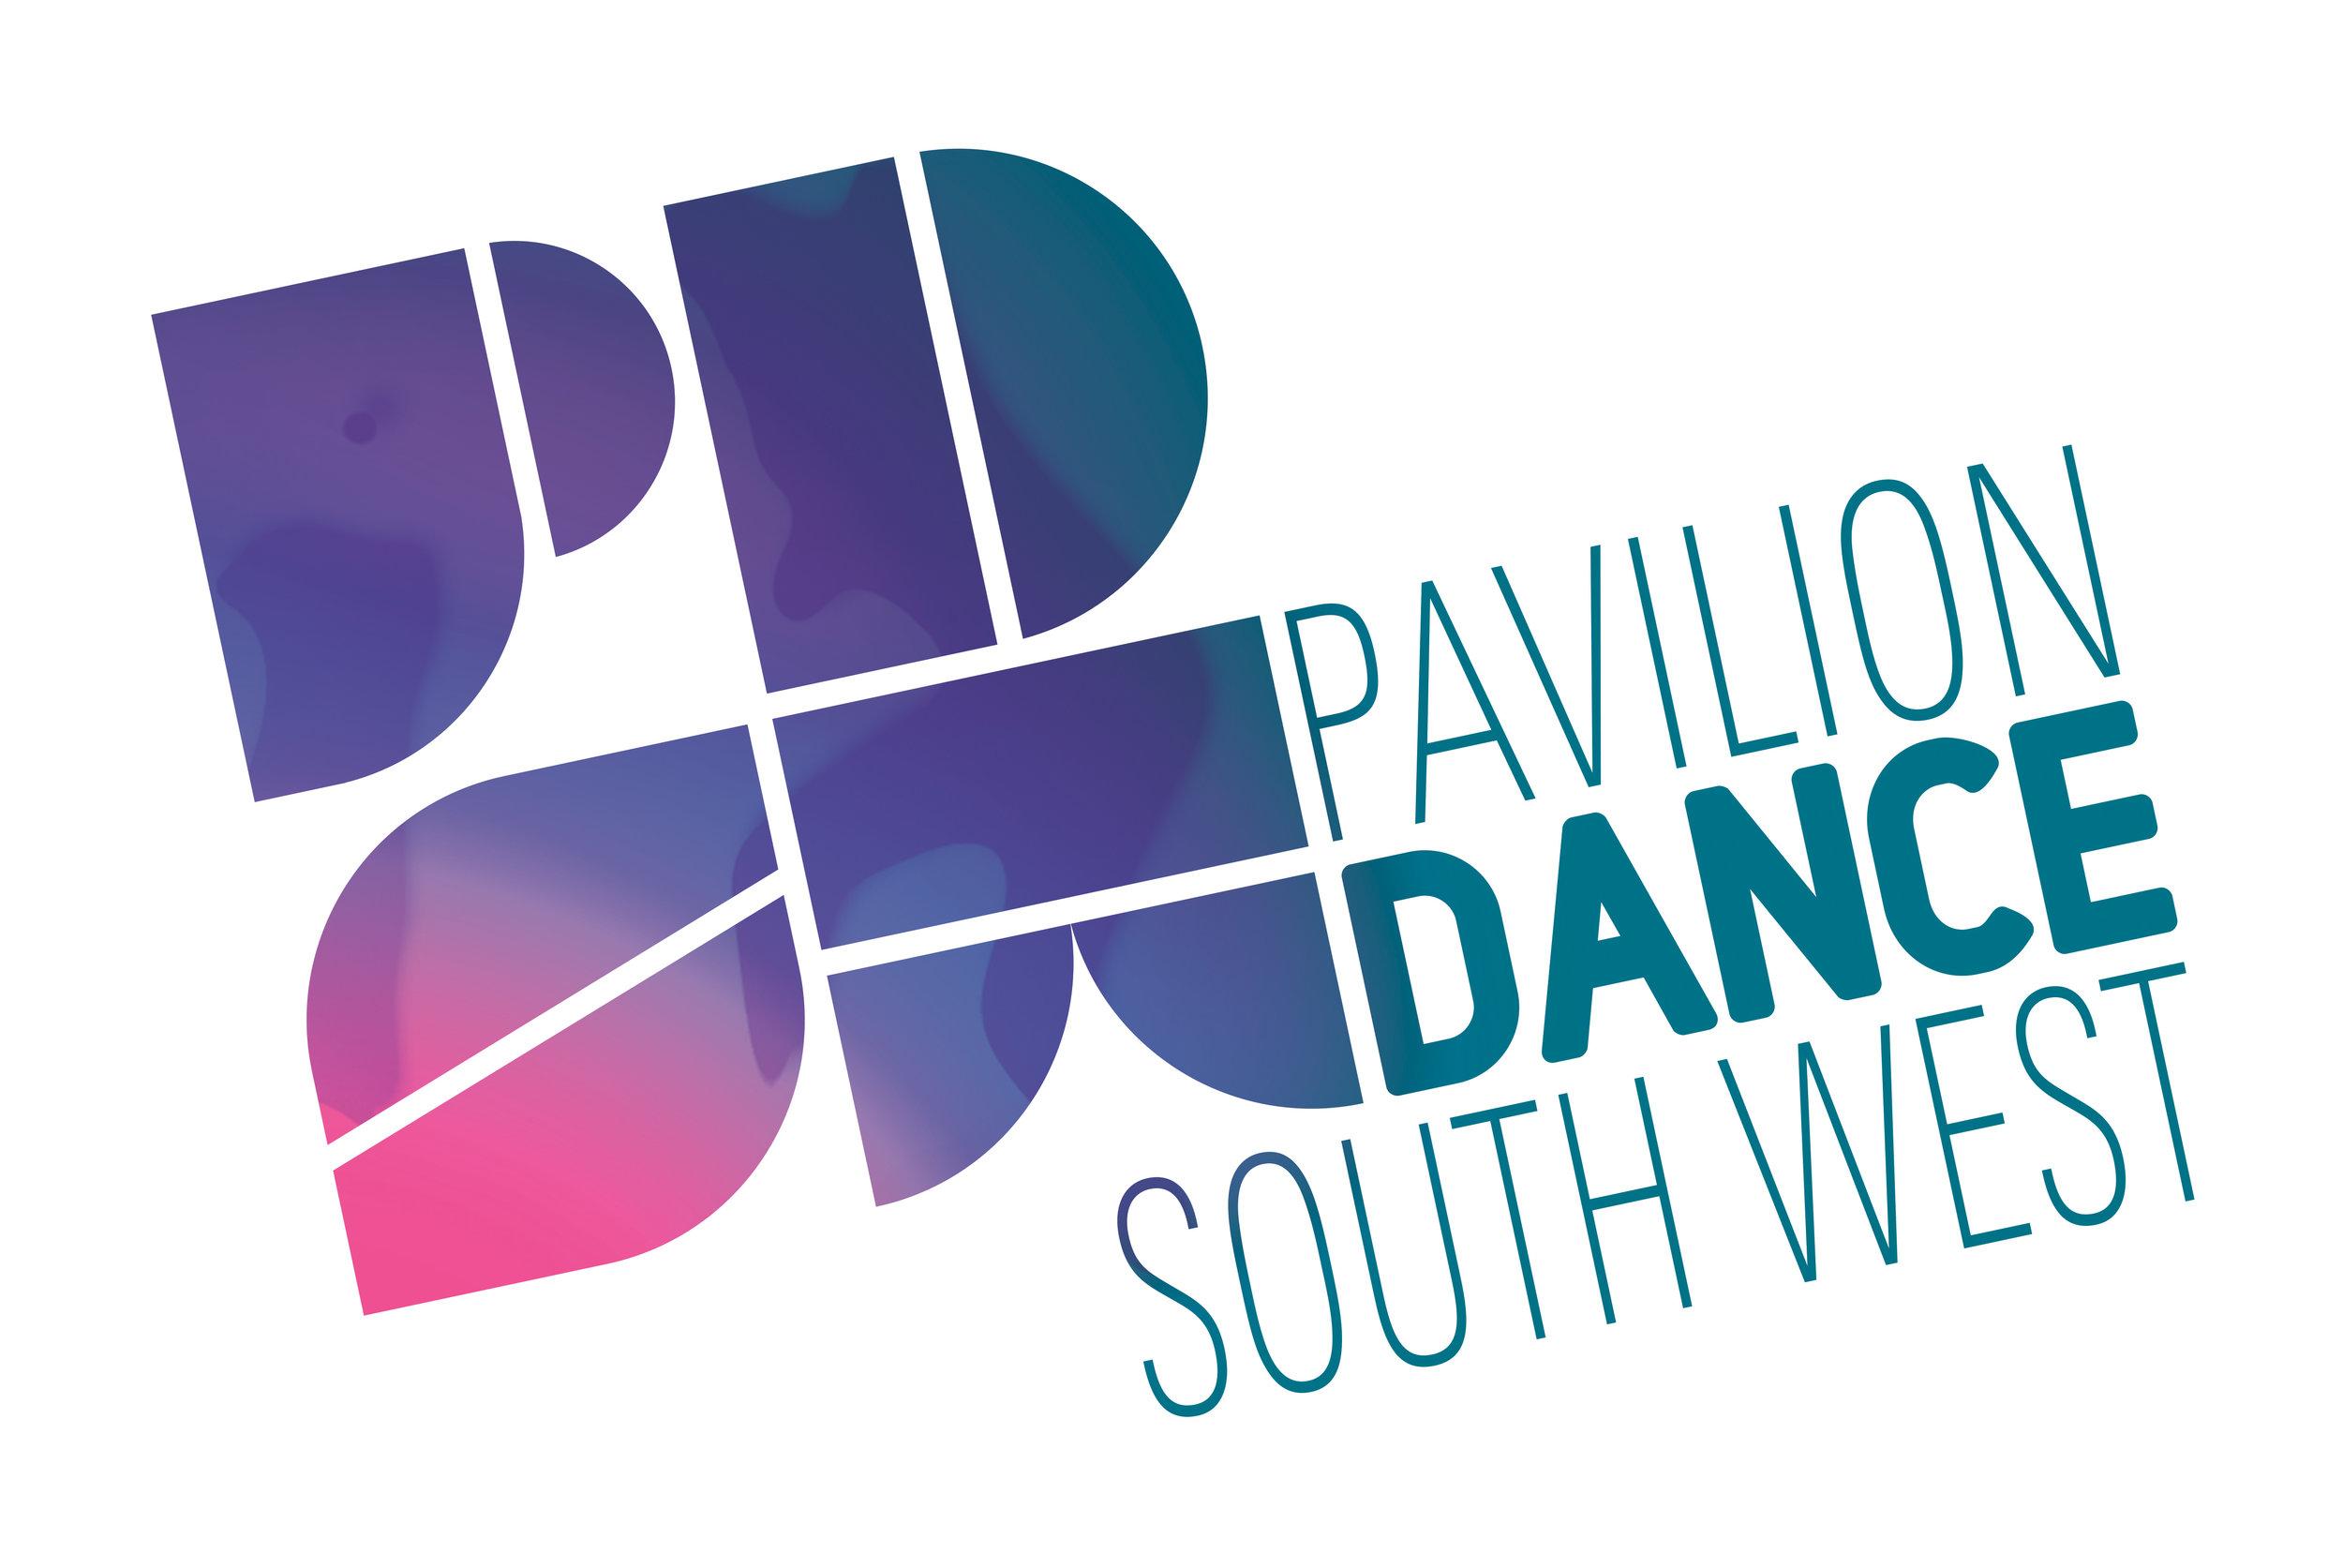 PDSW-LOGO-COL-WINTER-1-RGB.jpg